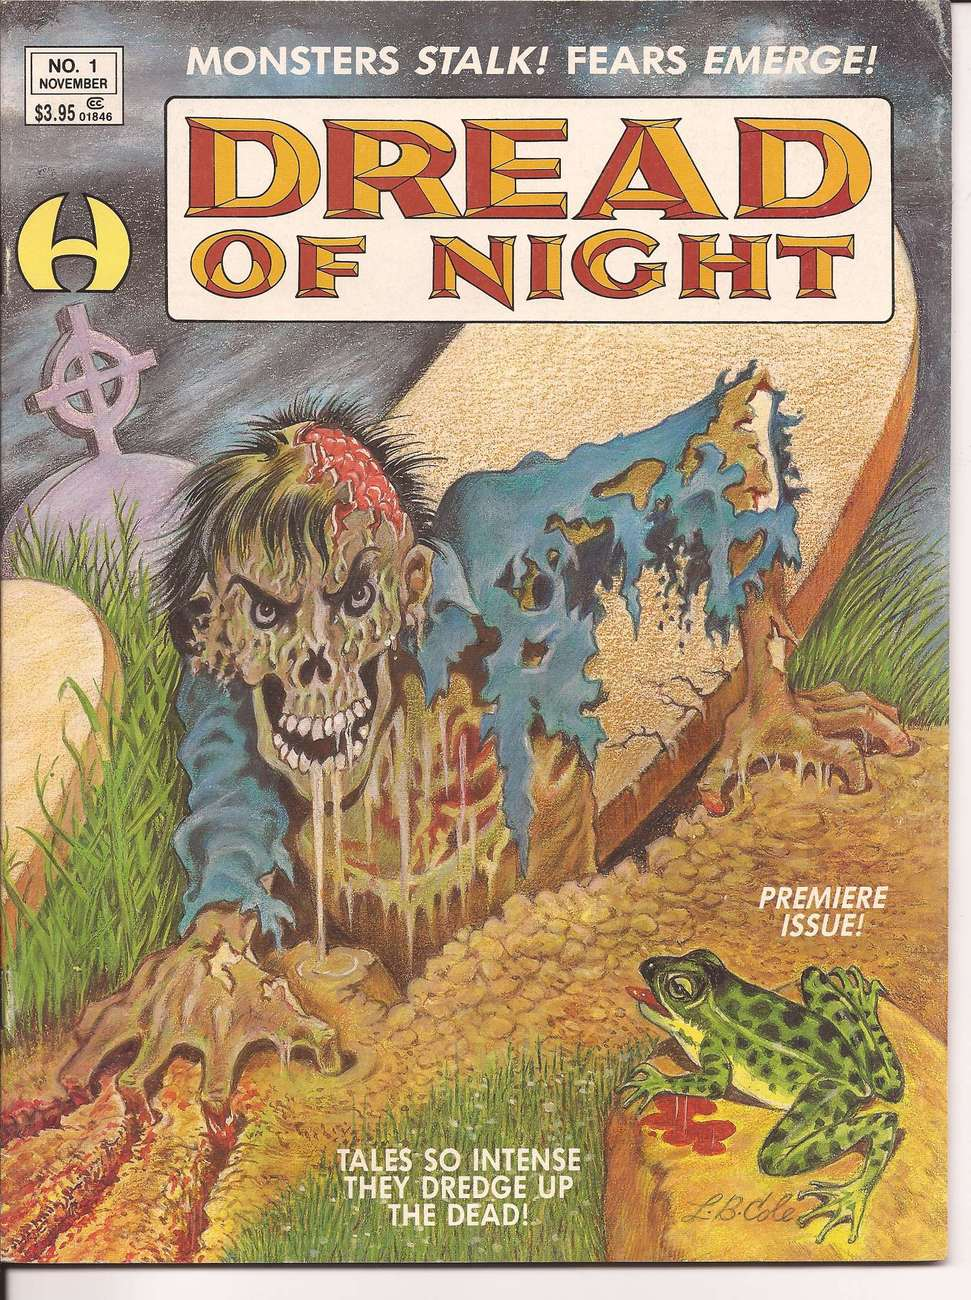 Dread of night